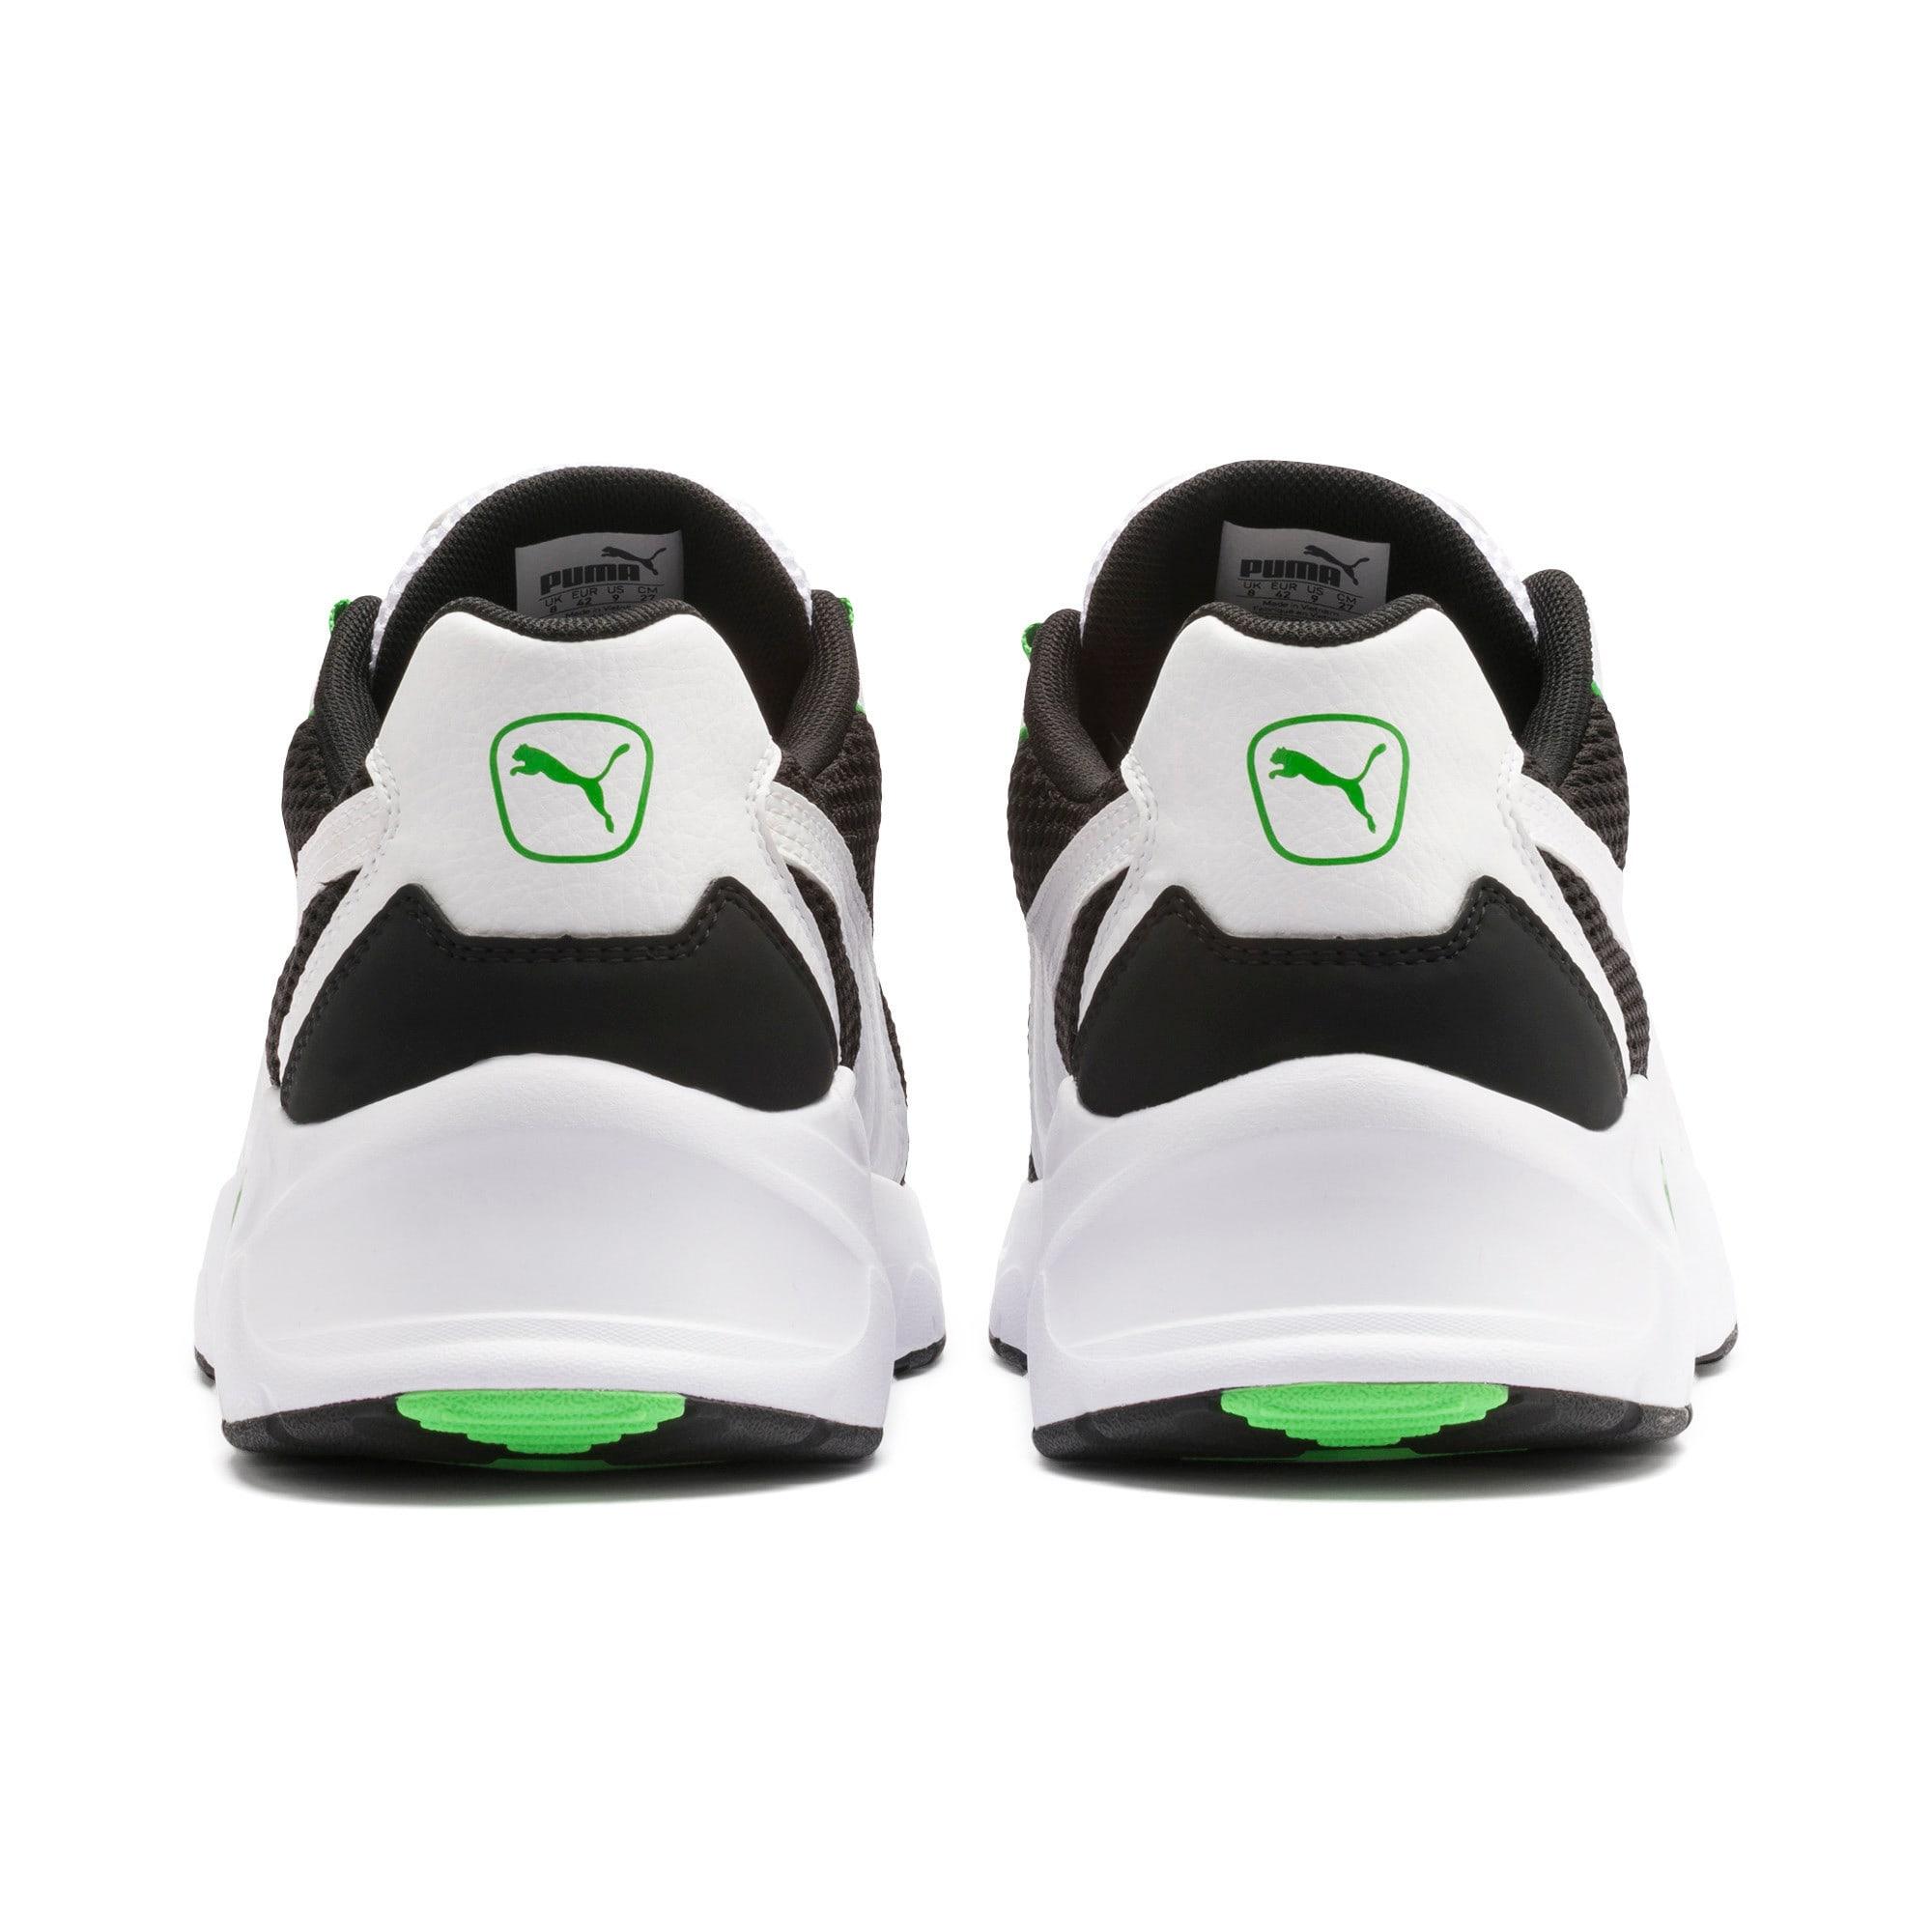 Imagen en miniatura 4 de Zapatillas de training Nucleus, Puma Black-Classic Green, mediana